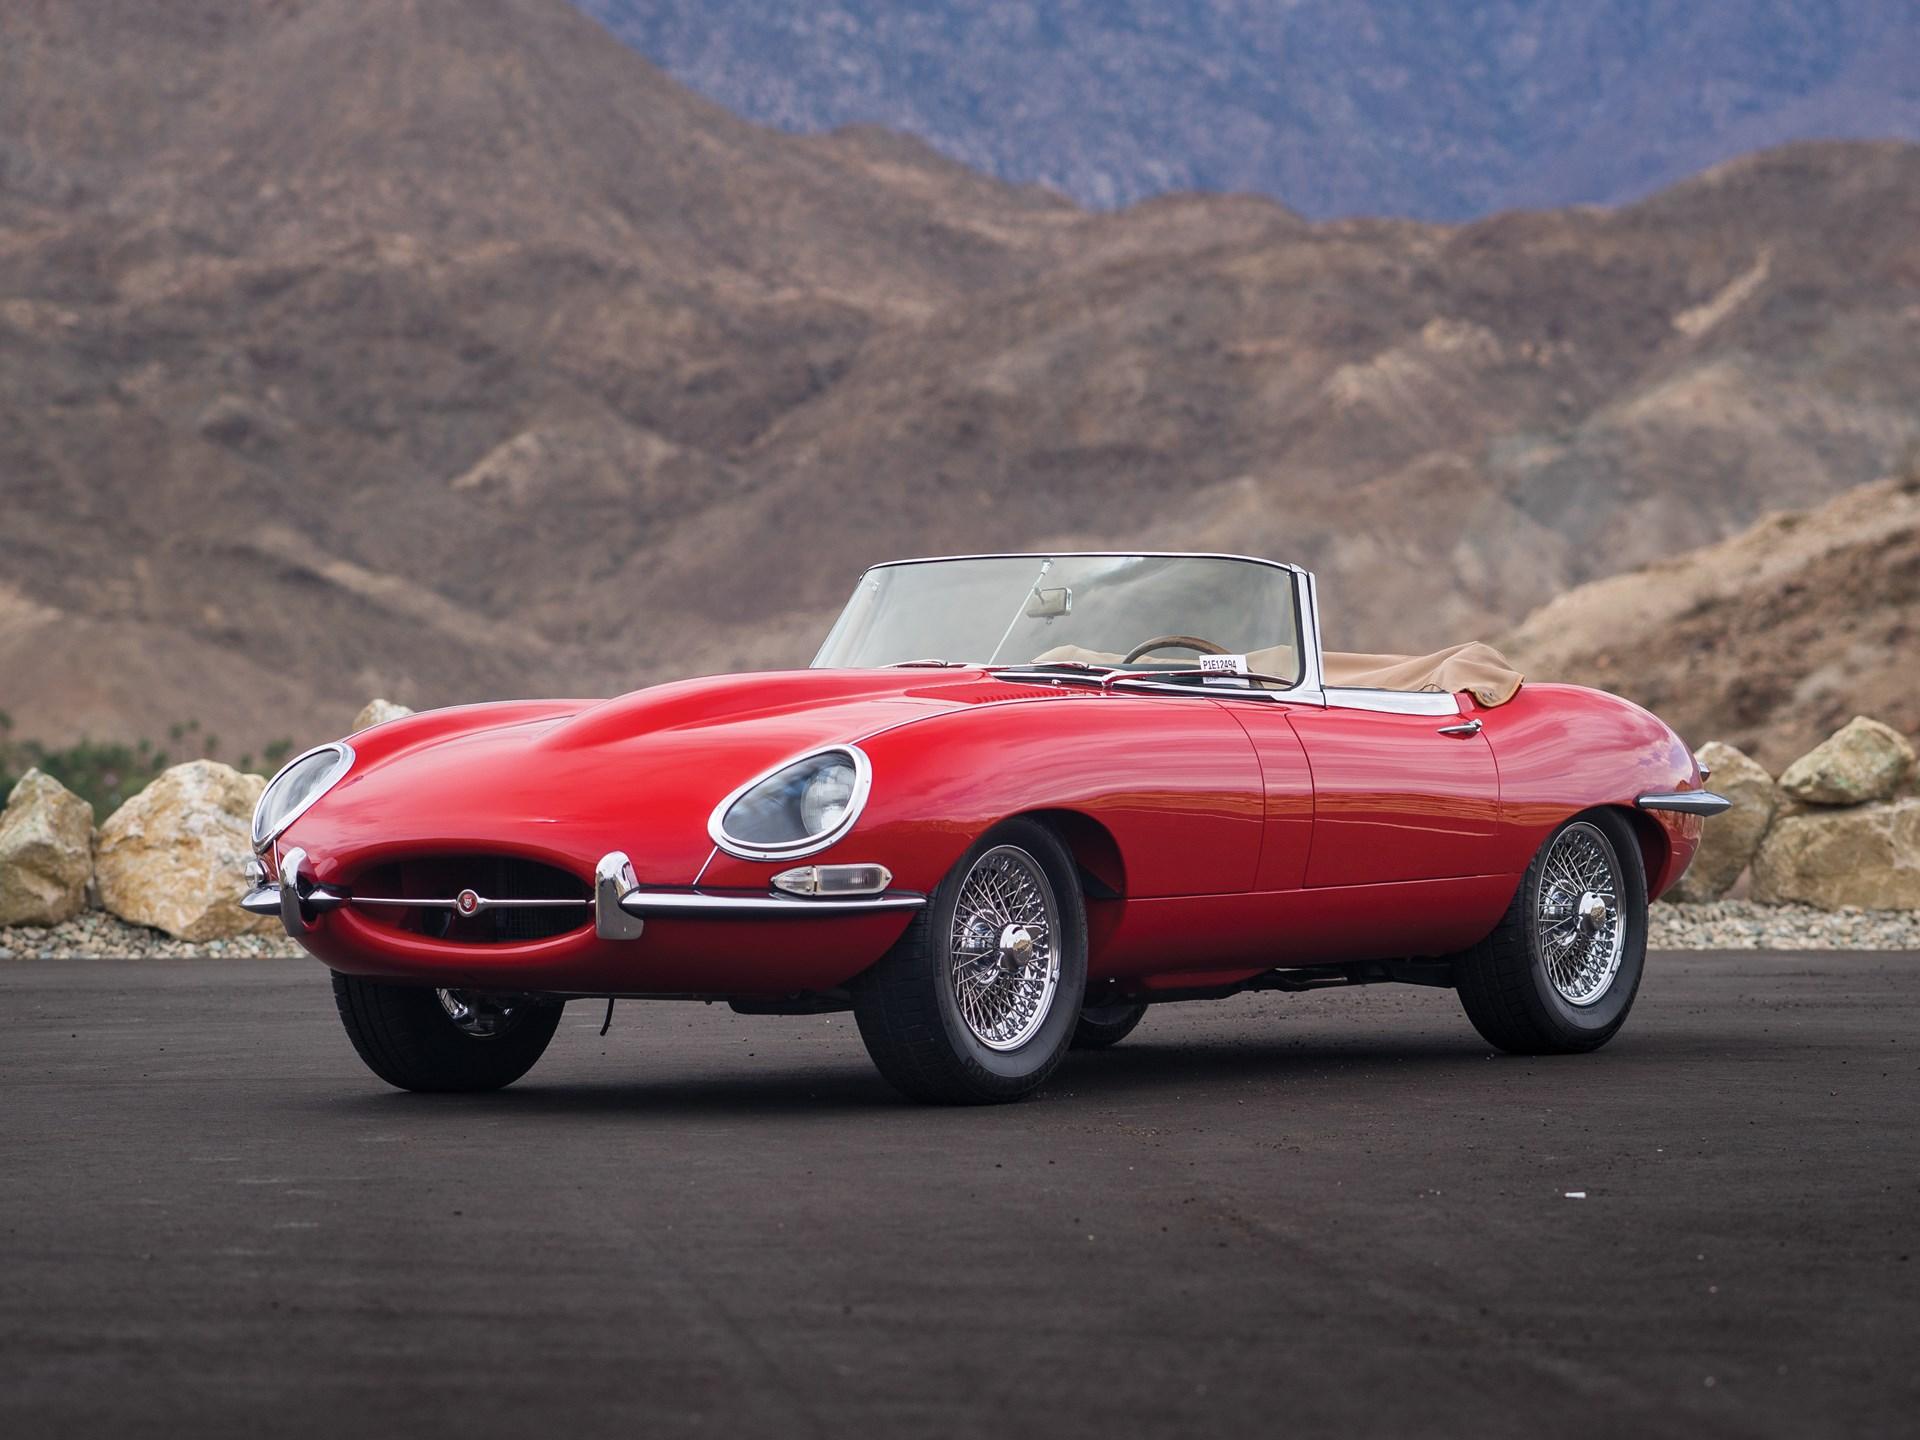 hight resolution of 1965 jaguar e type series 1 4 2 litre roadster